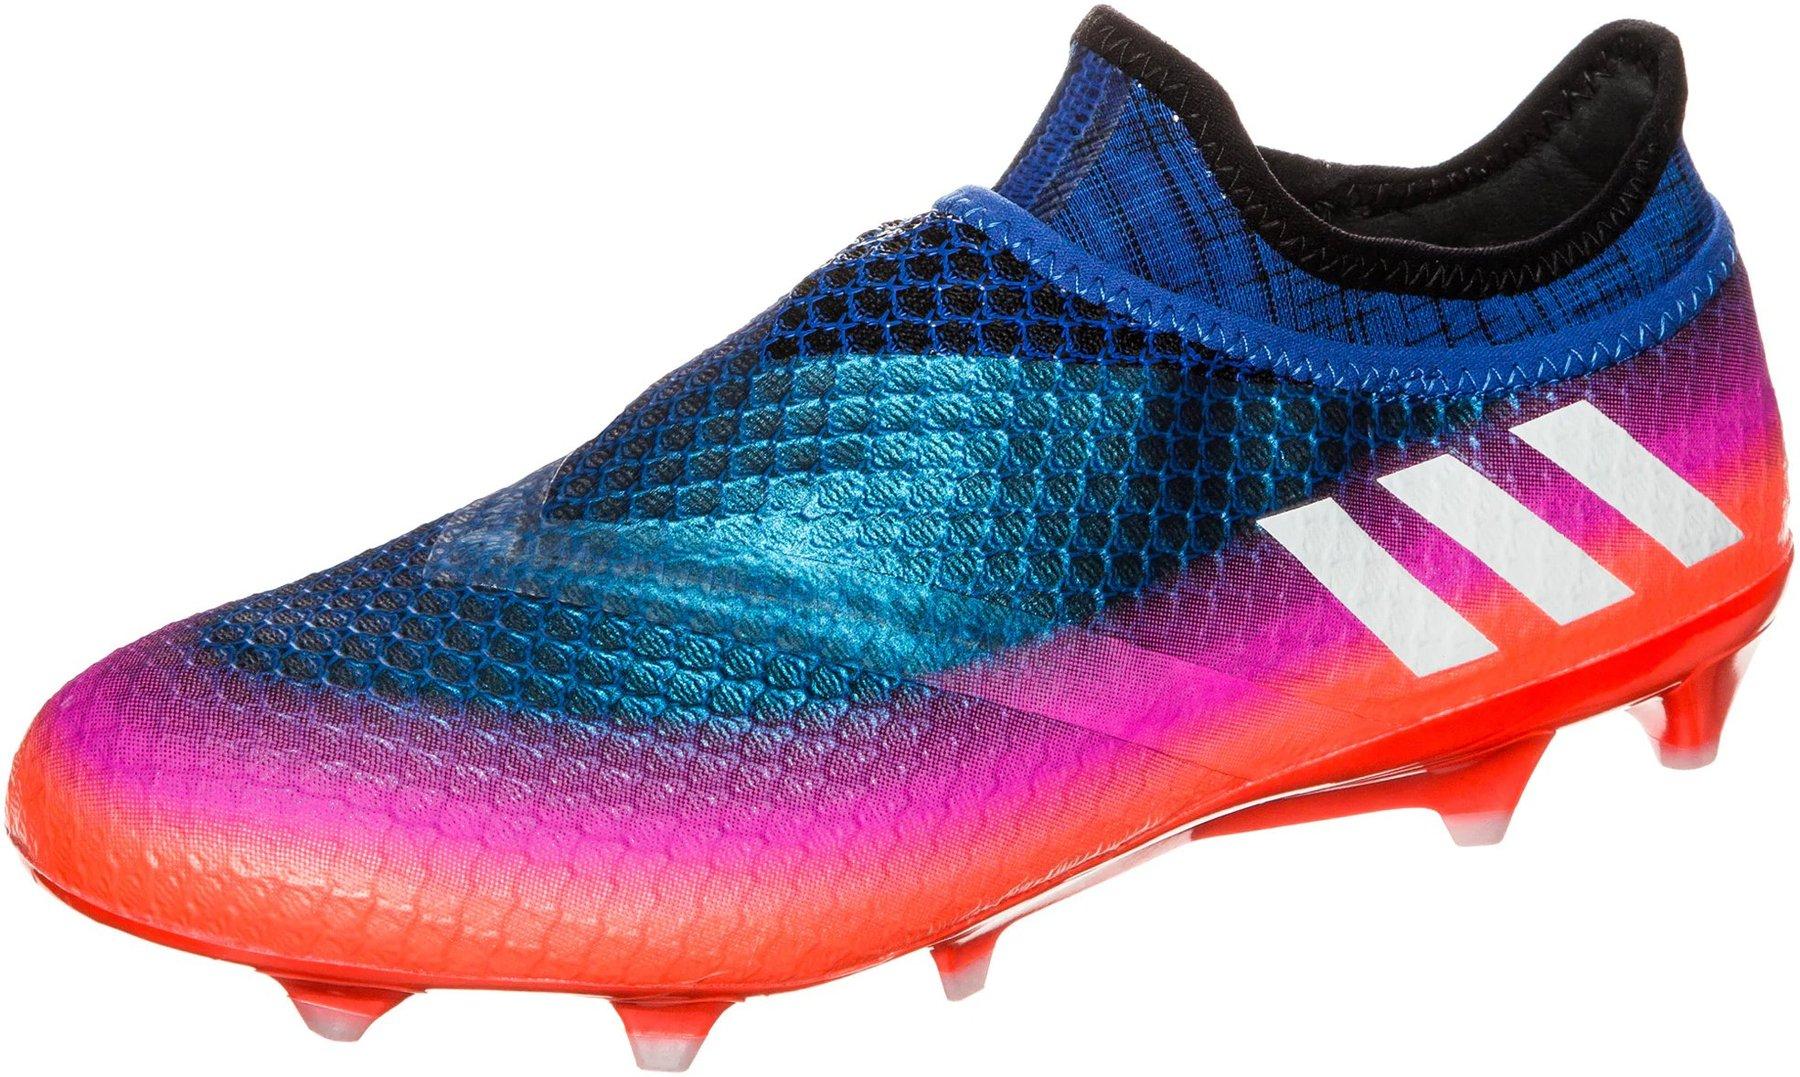 adidas X 16.1 FG Fußballschuhe 44, 59,90 ?